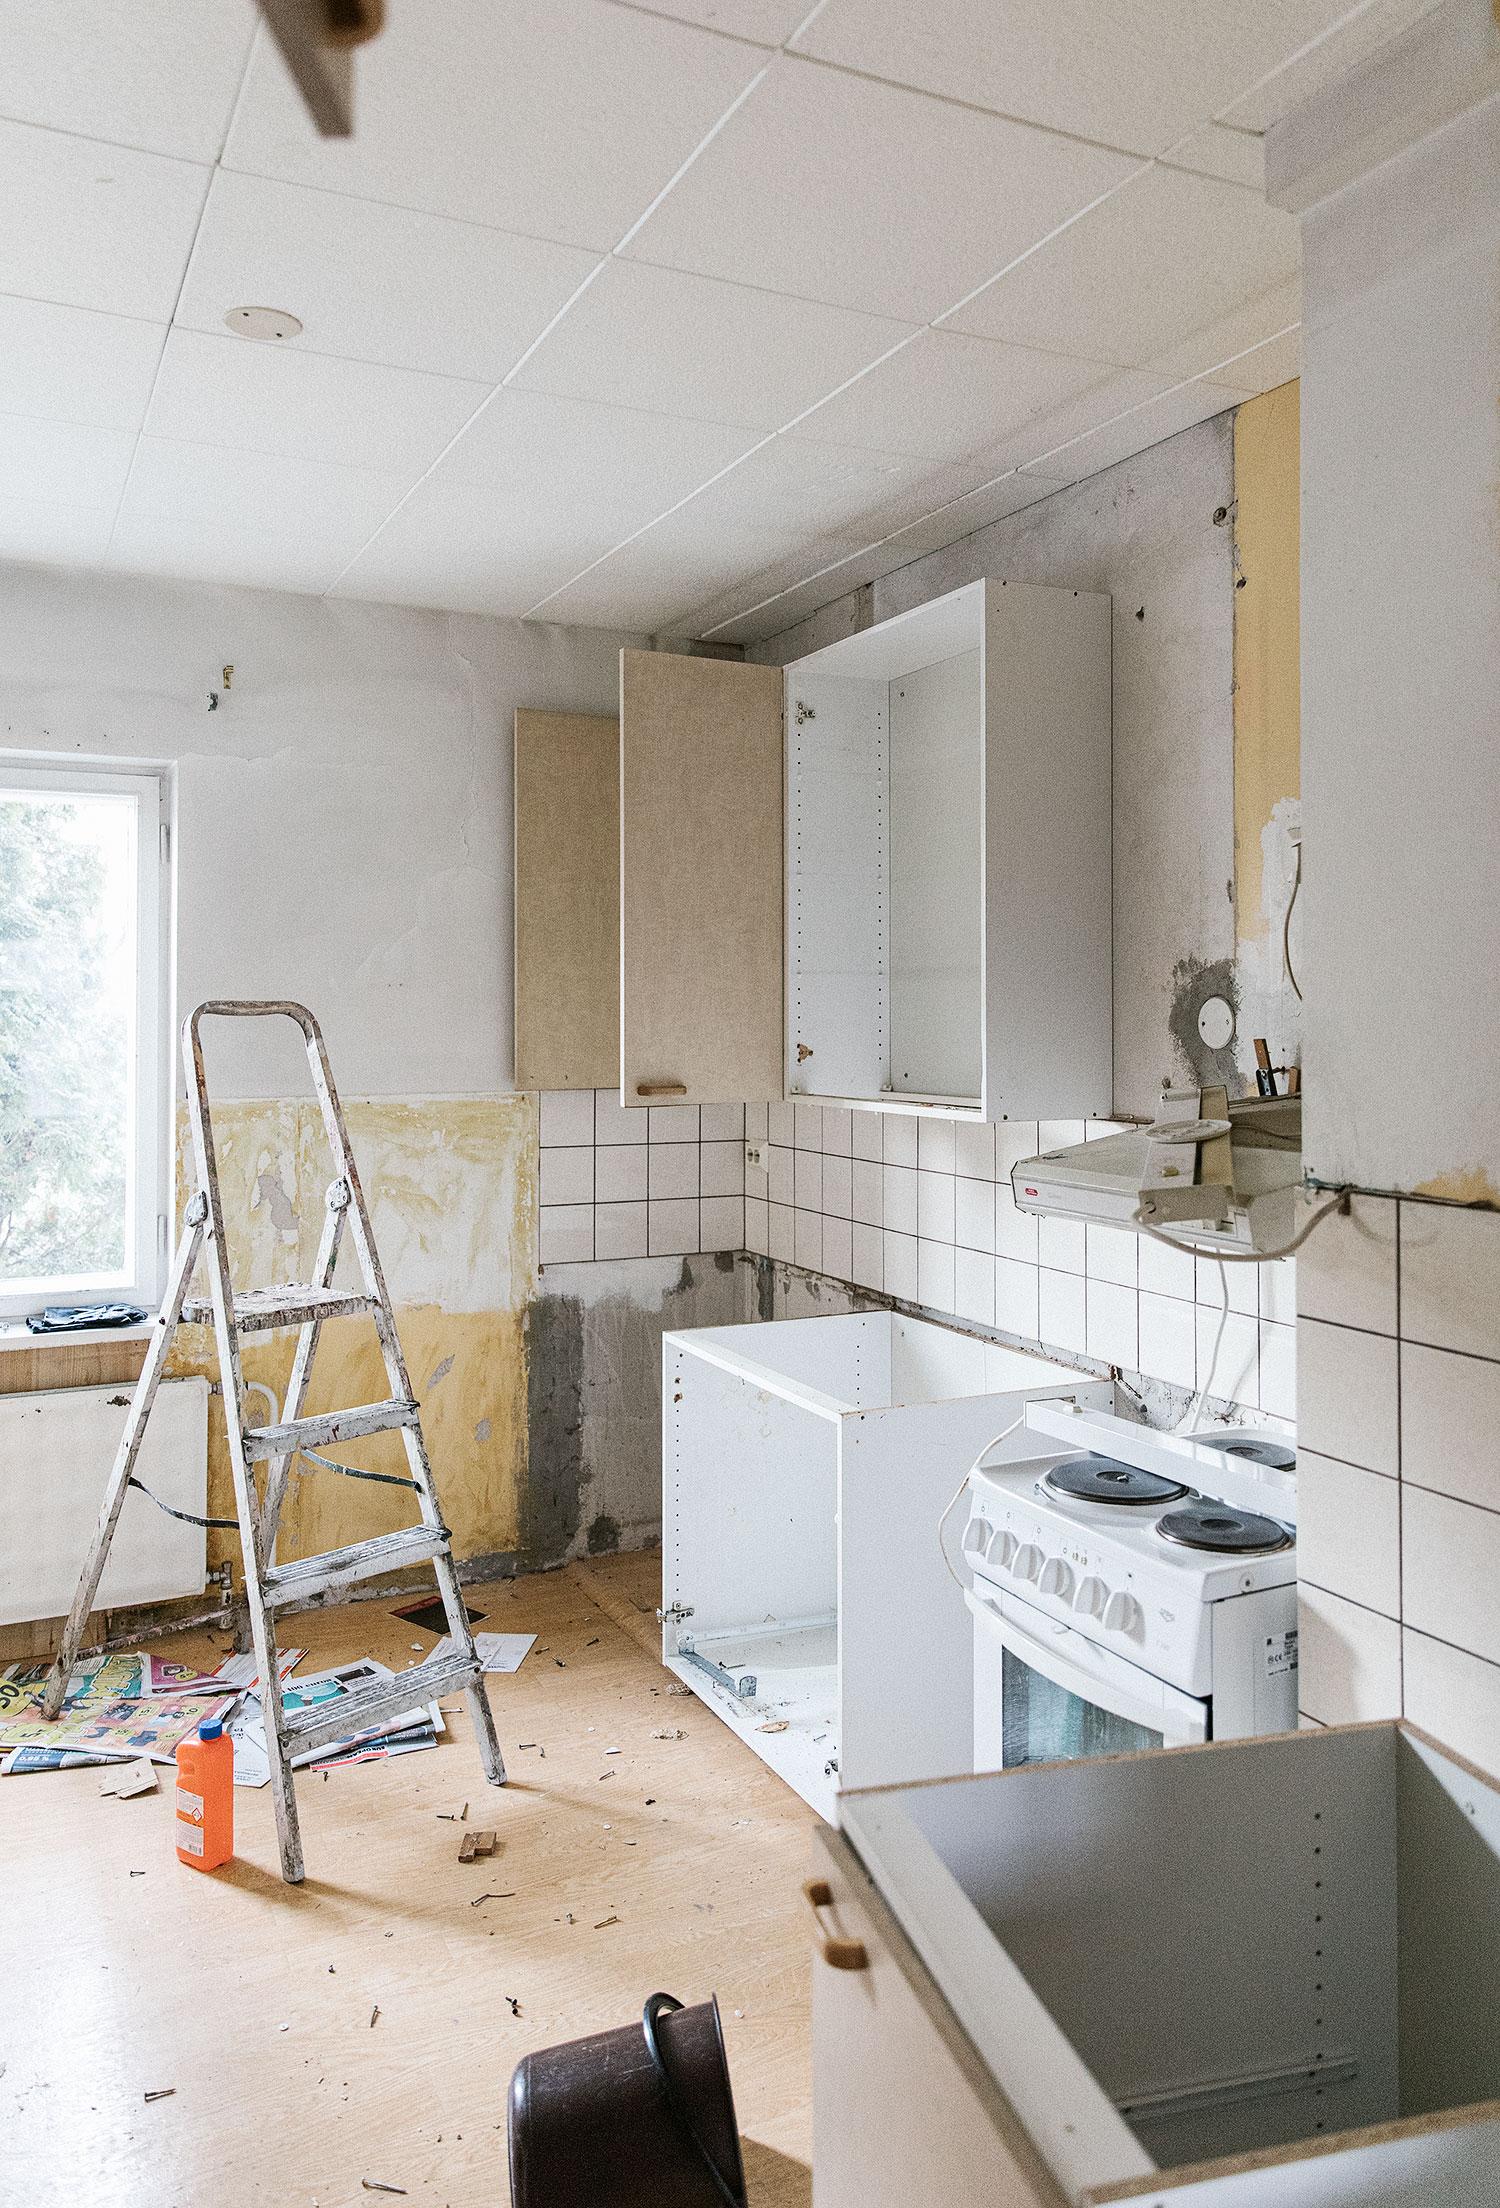 Vanhan keittiön purkua.